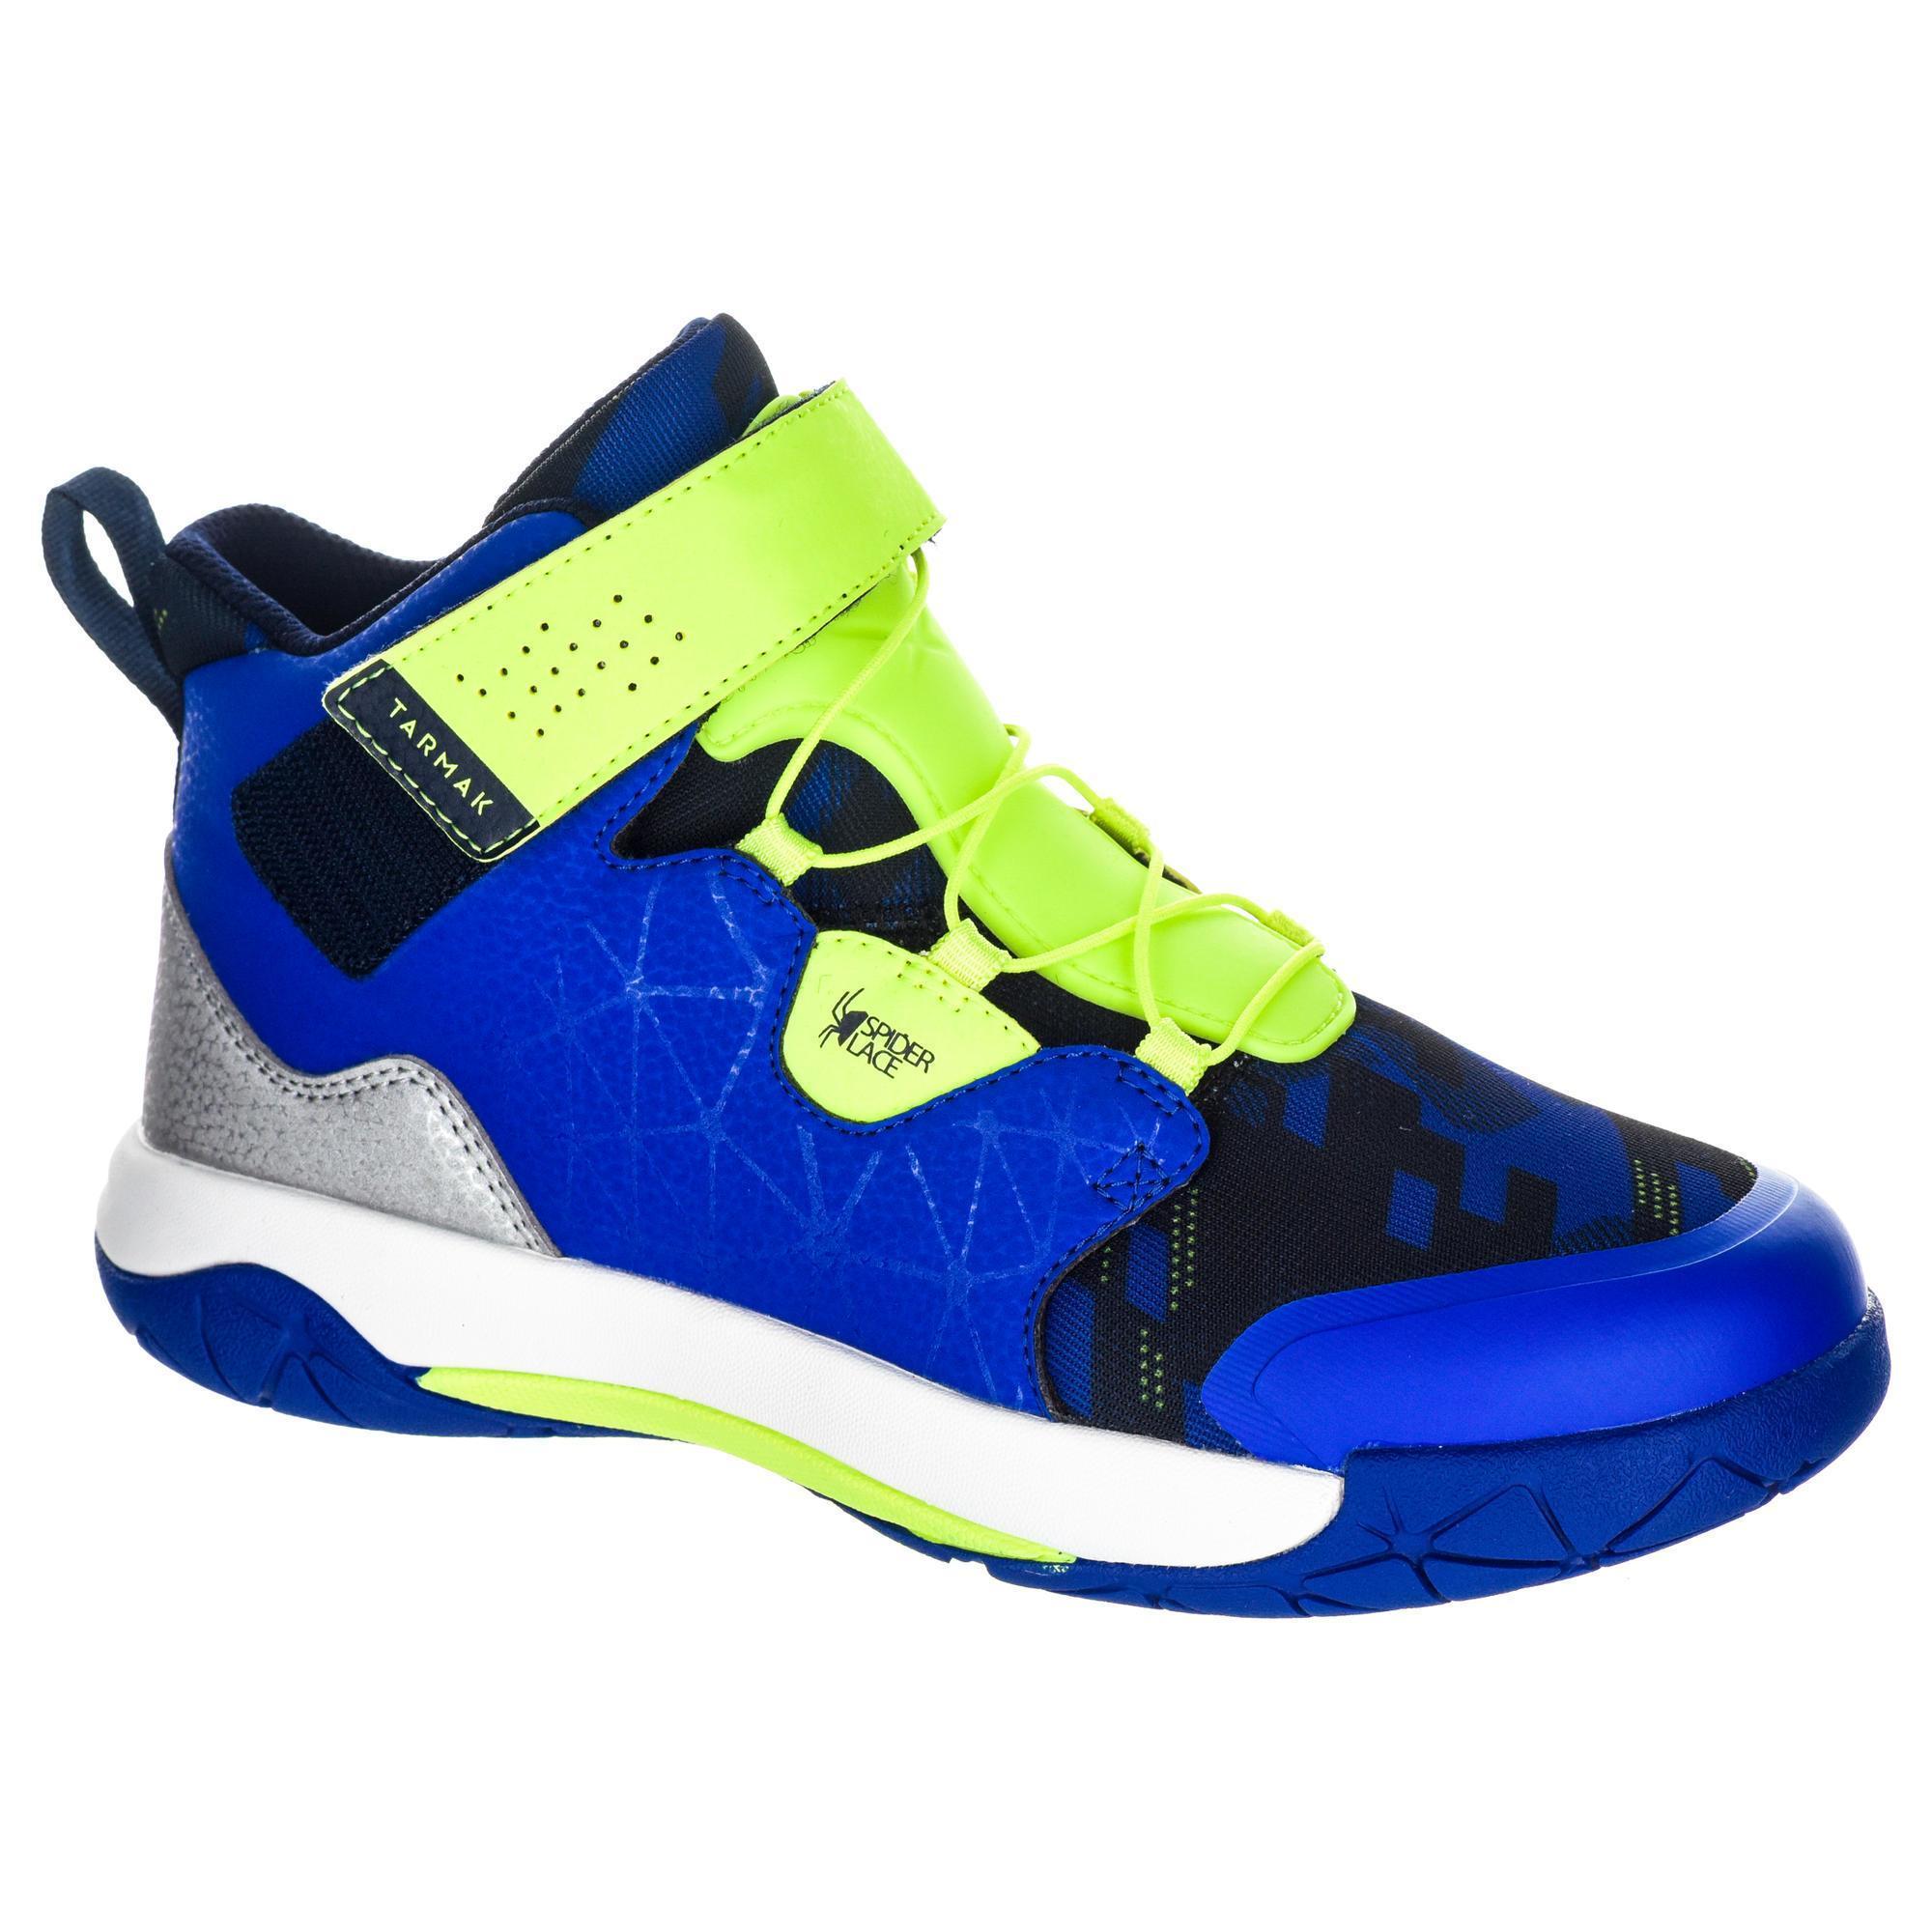 Tarmak Basketbalschoenen Spider Lace blauw/geel